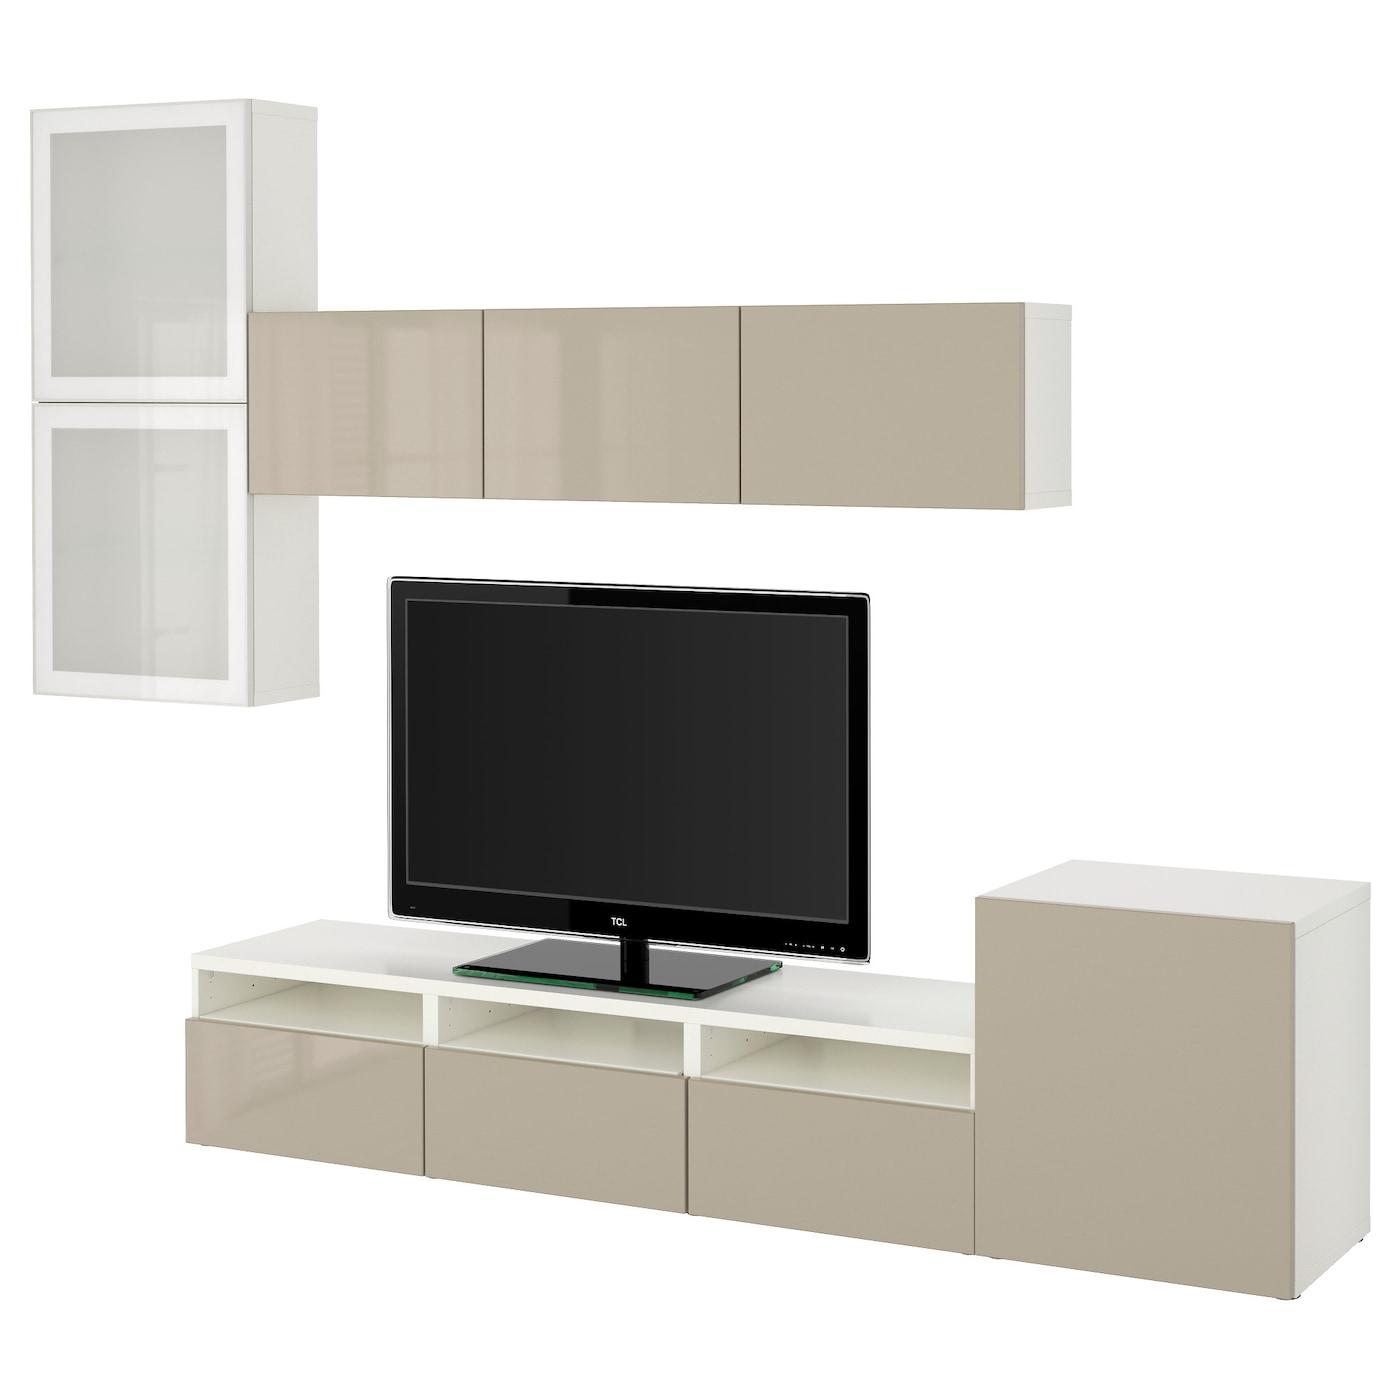 Tv Wall Unit Ikea Bestå Tv Storage Combinationglass Doors Whiteselsviken High